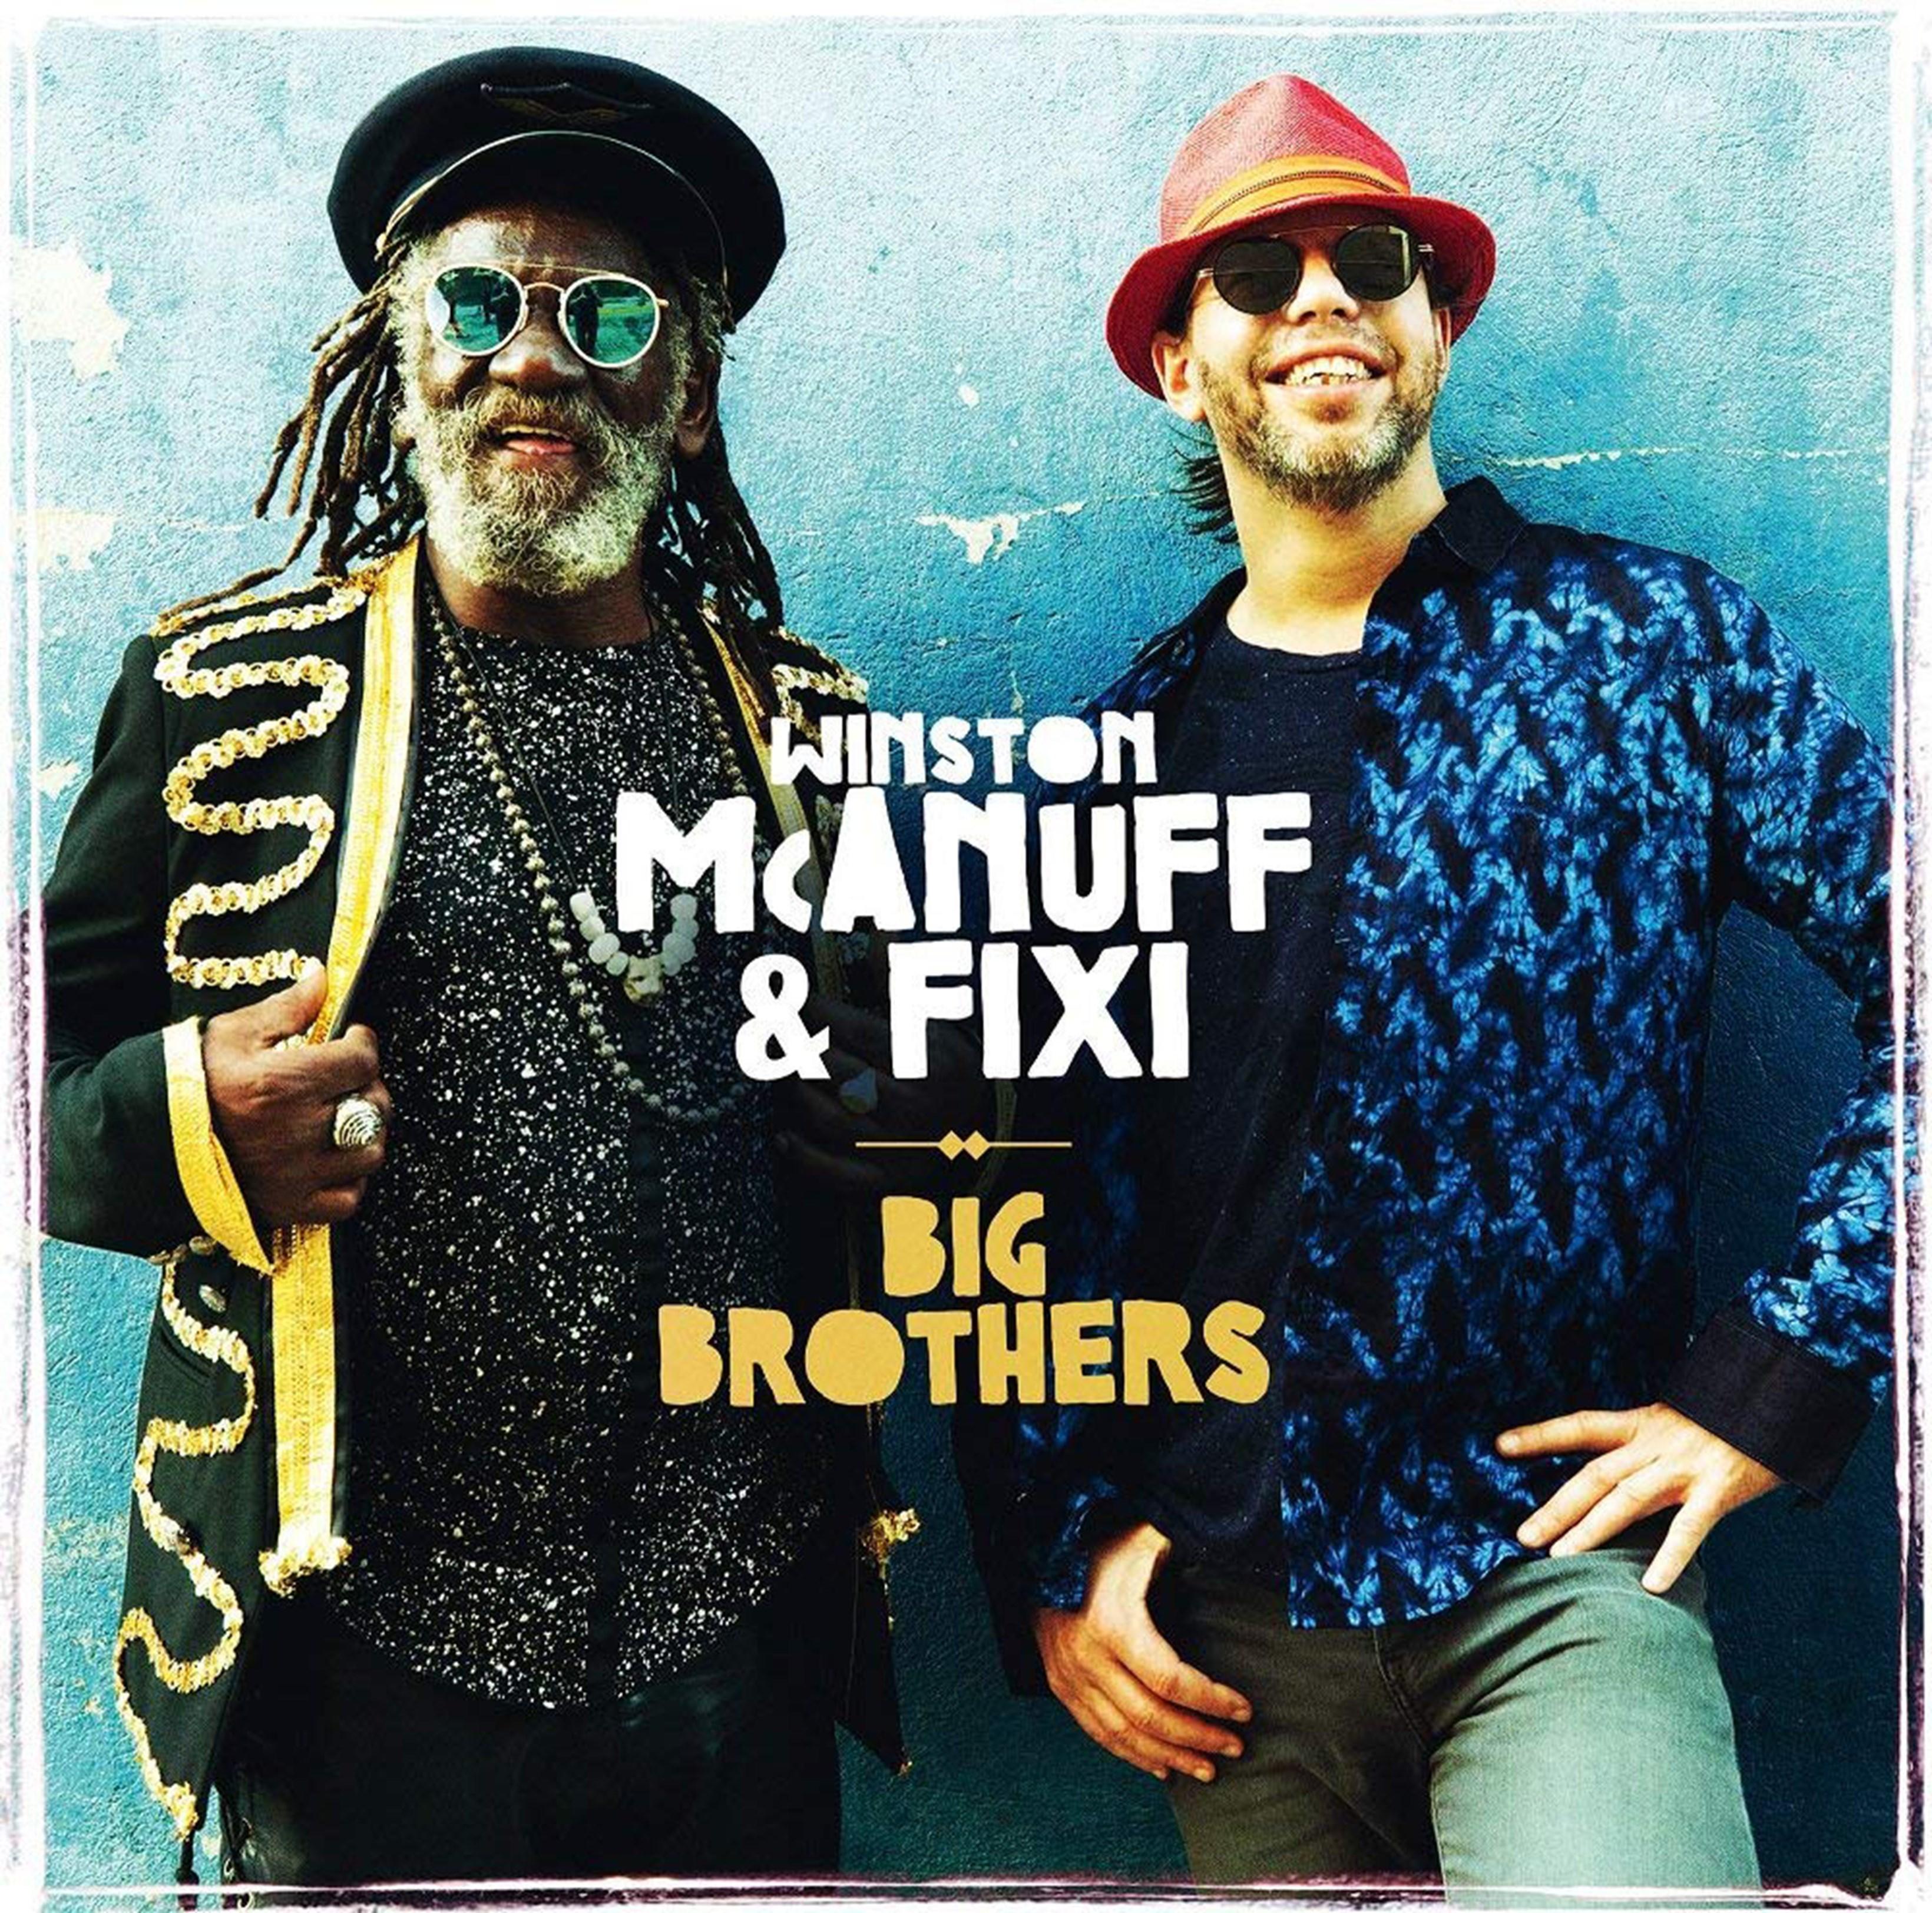 Big Brothers - 1